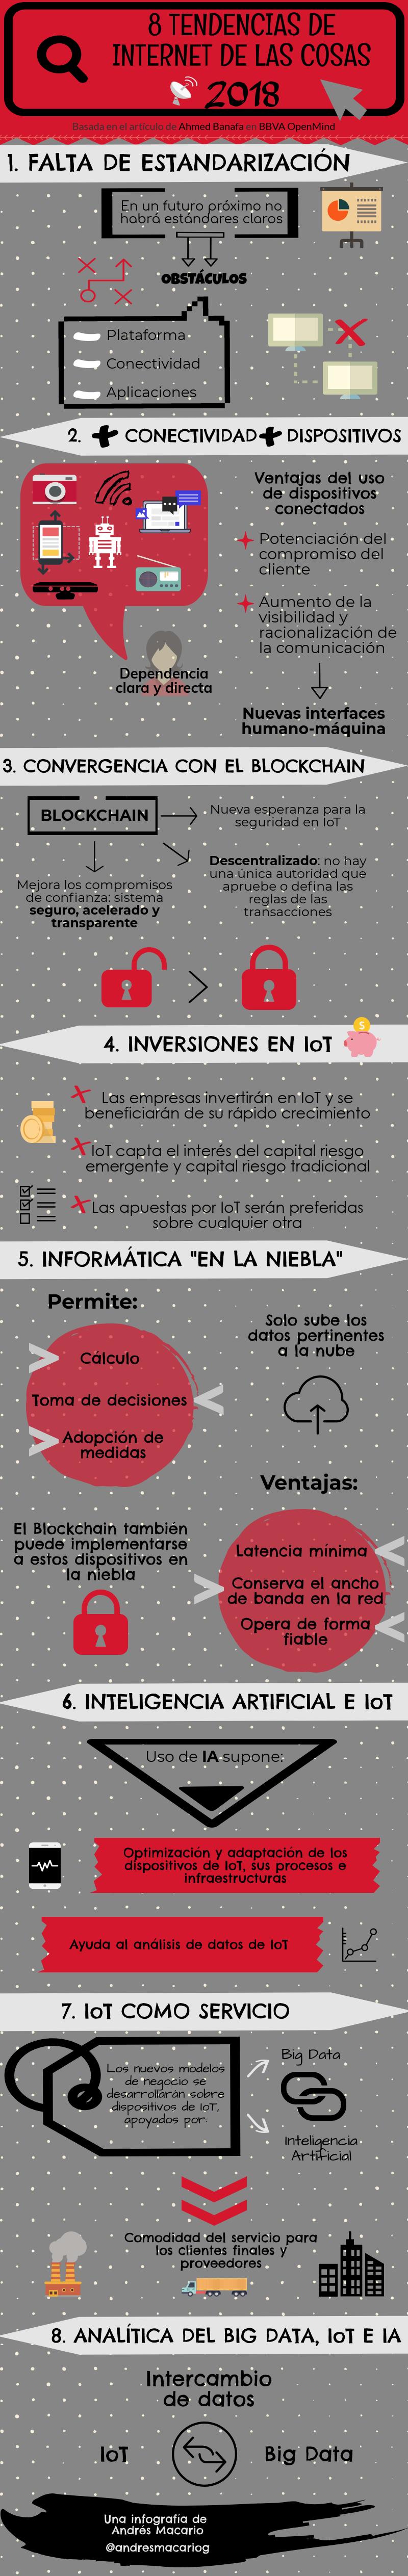 8 tendencias de IoT - infografía de Andrés Macario